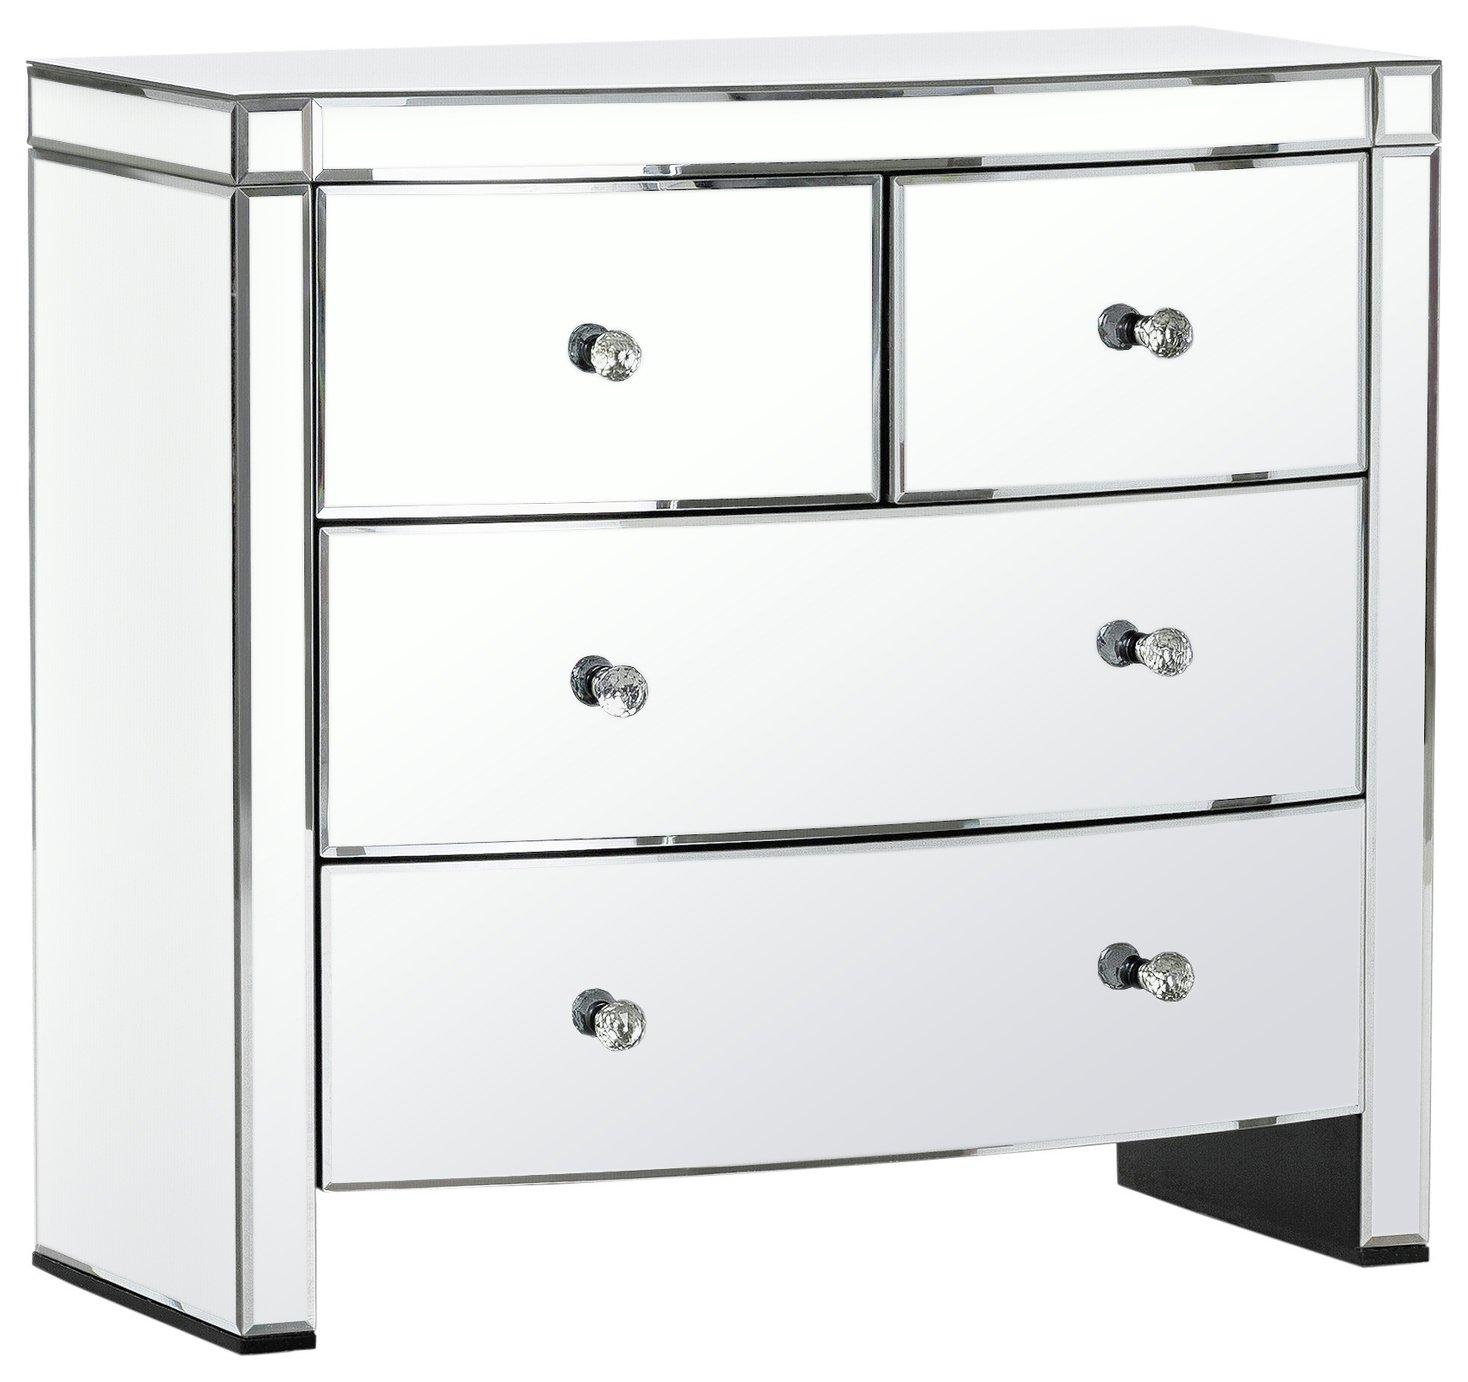 Argos Home Canzano 4 Drawer Mirrored Chest